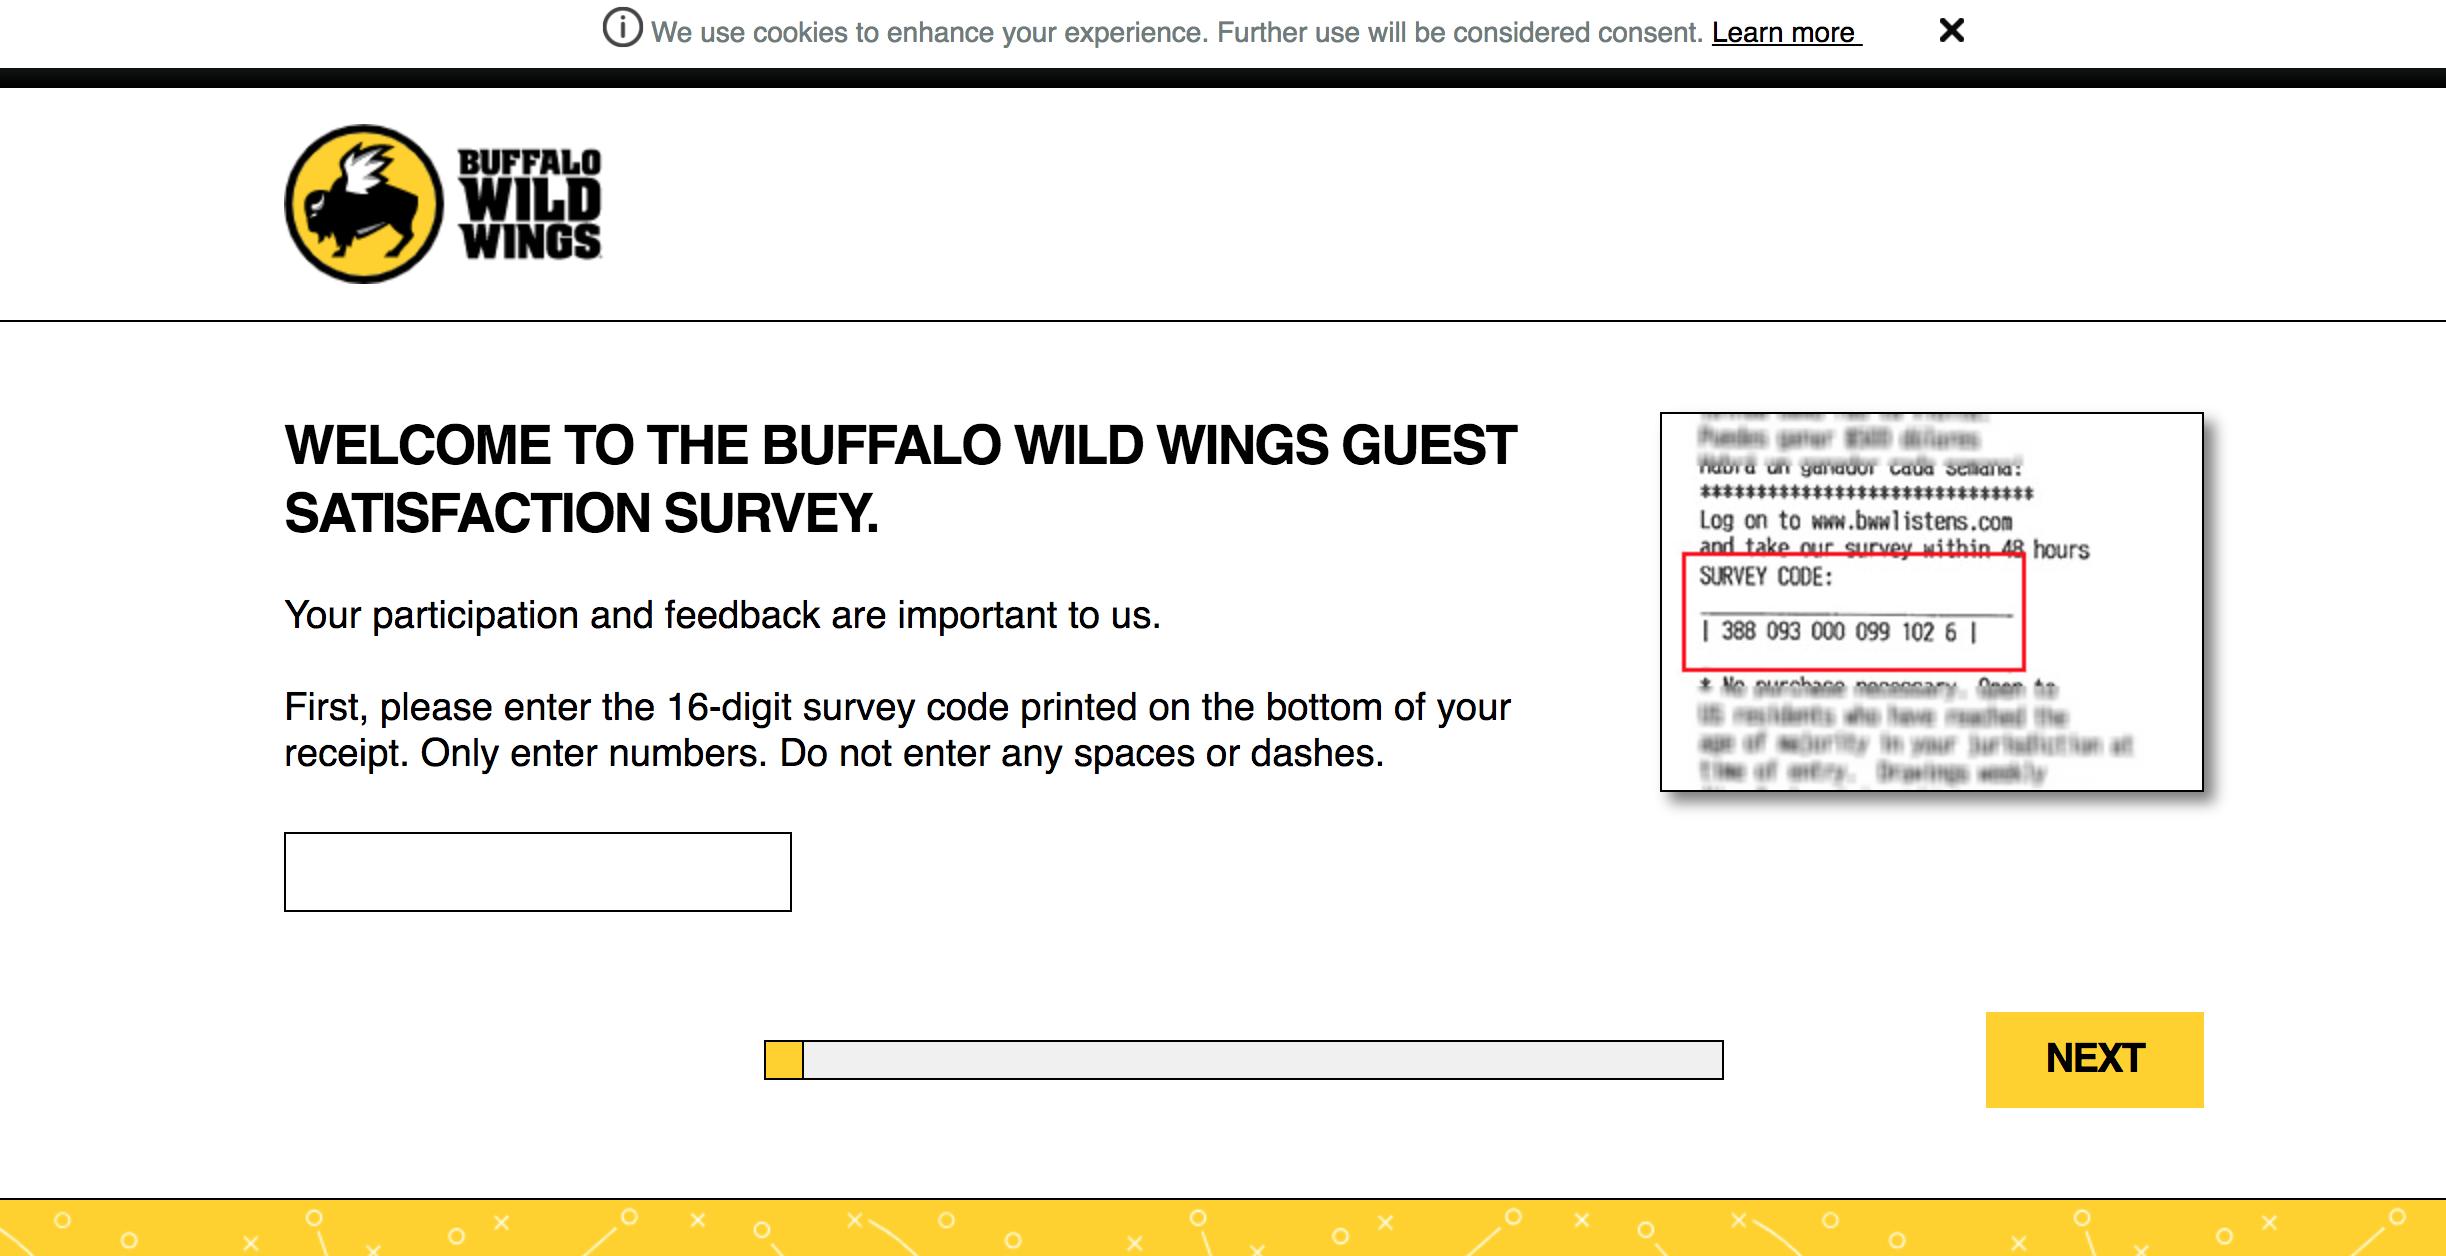 bwwlistens.com survey homepage